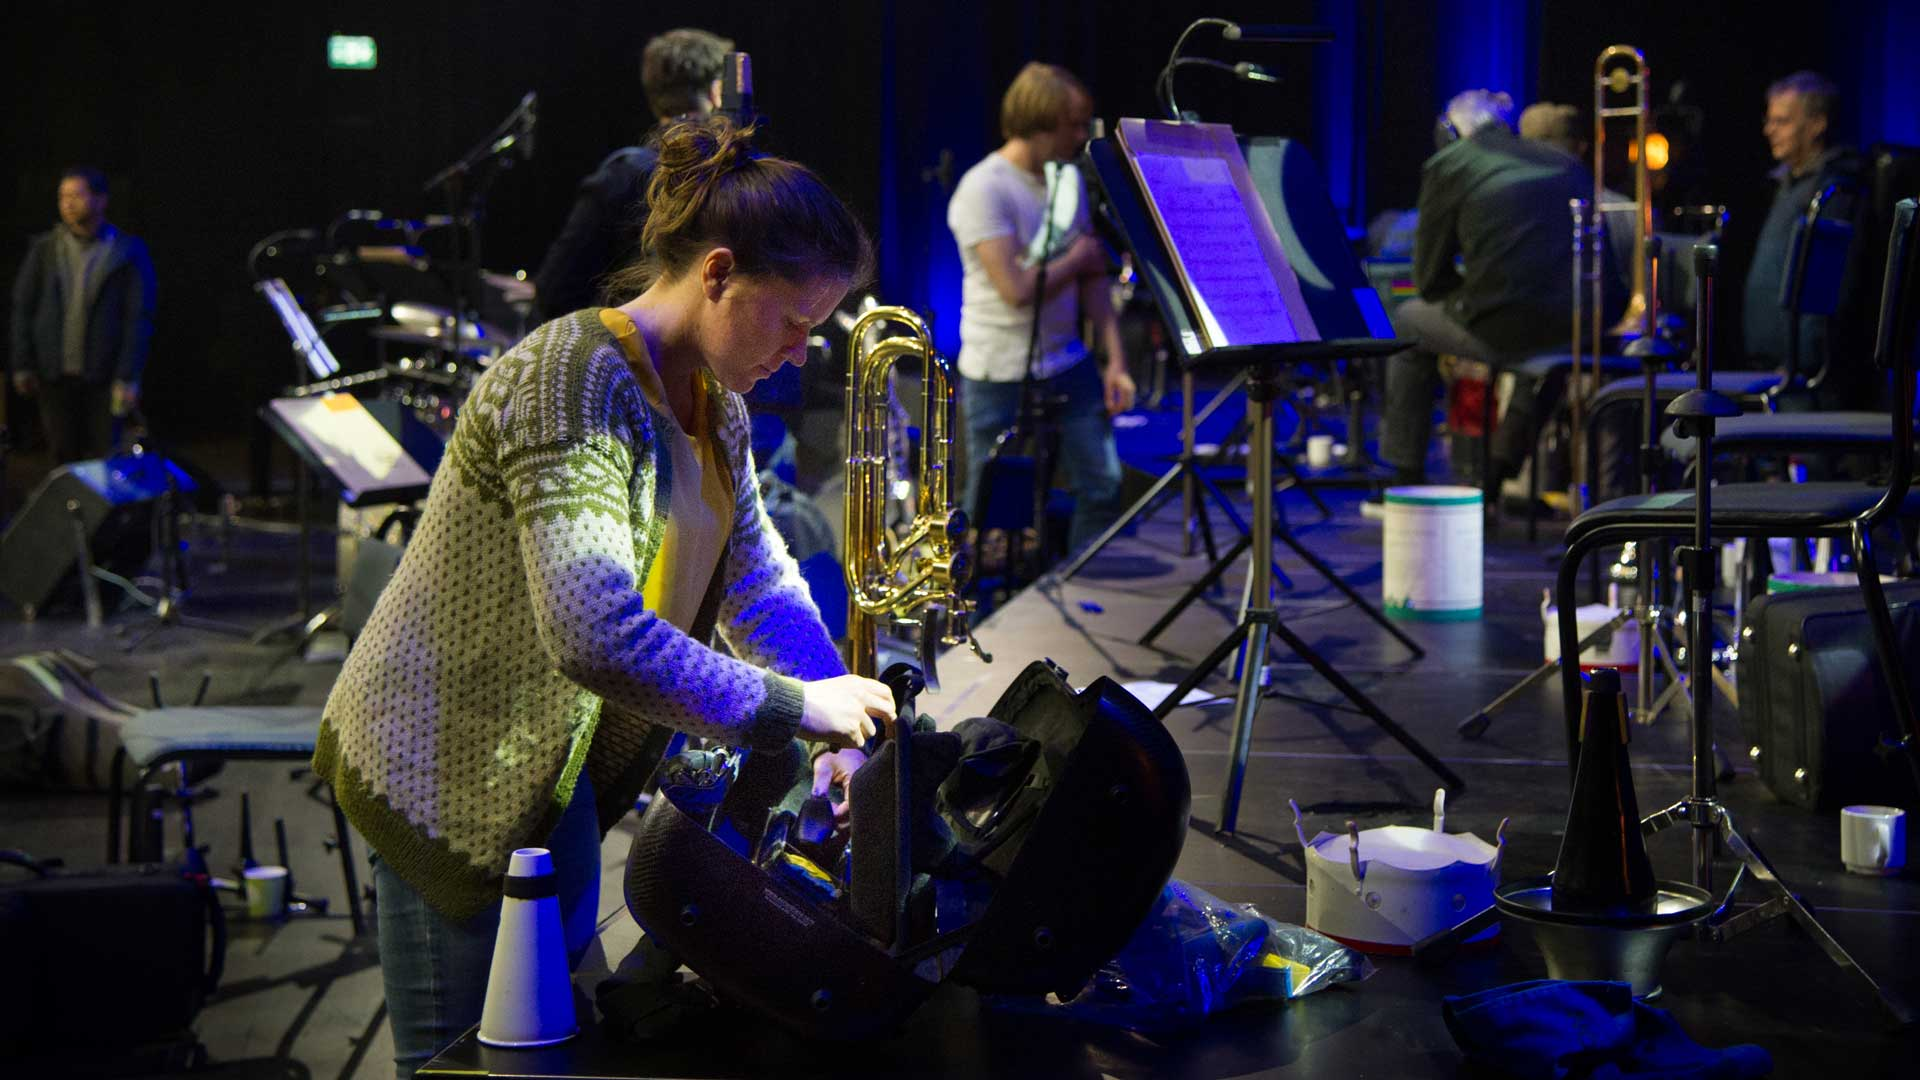 Ingrid packar ner sitt instrument efter en repetition